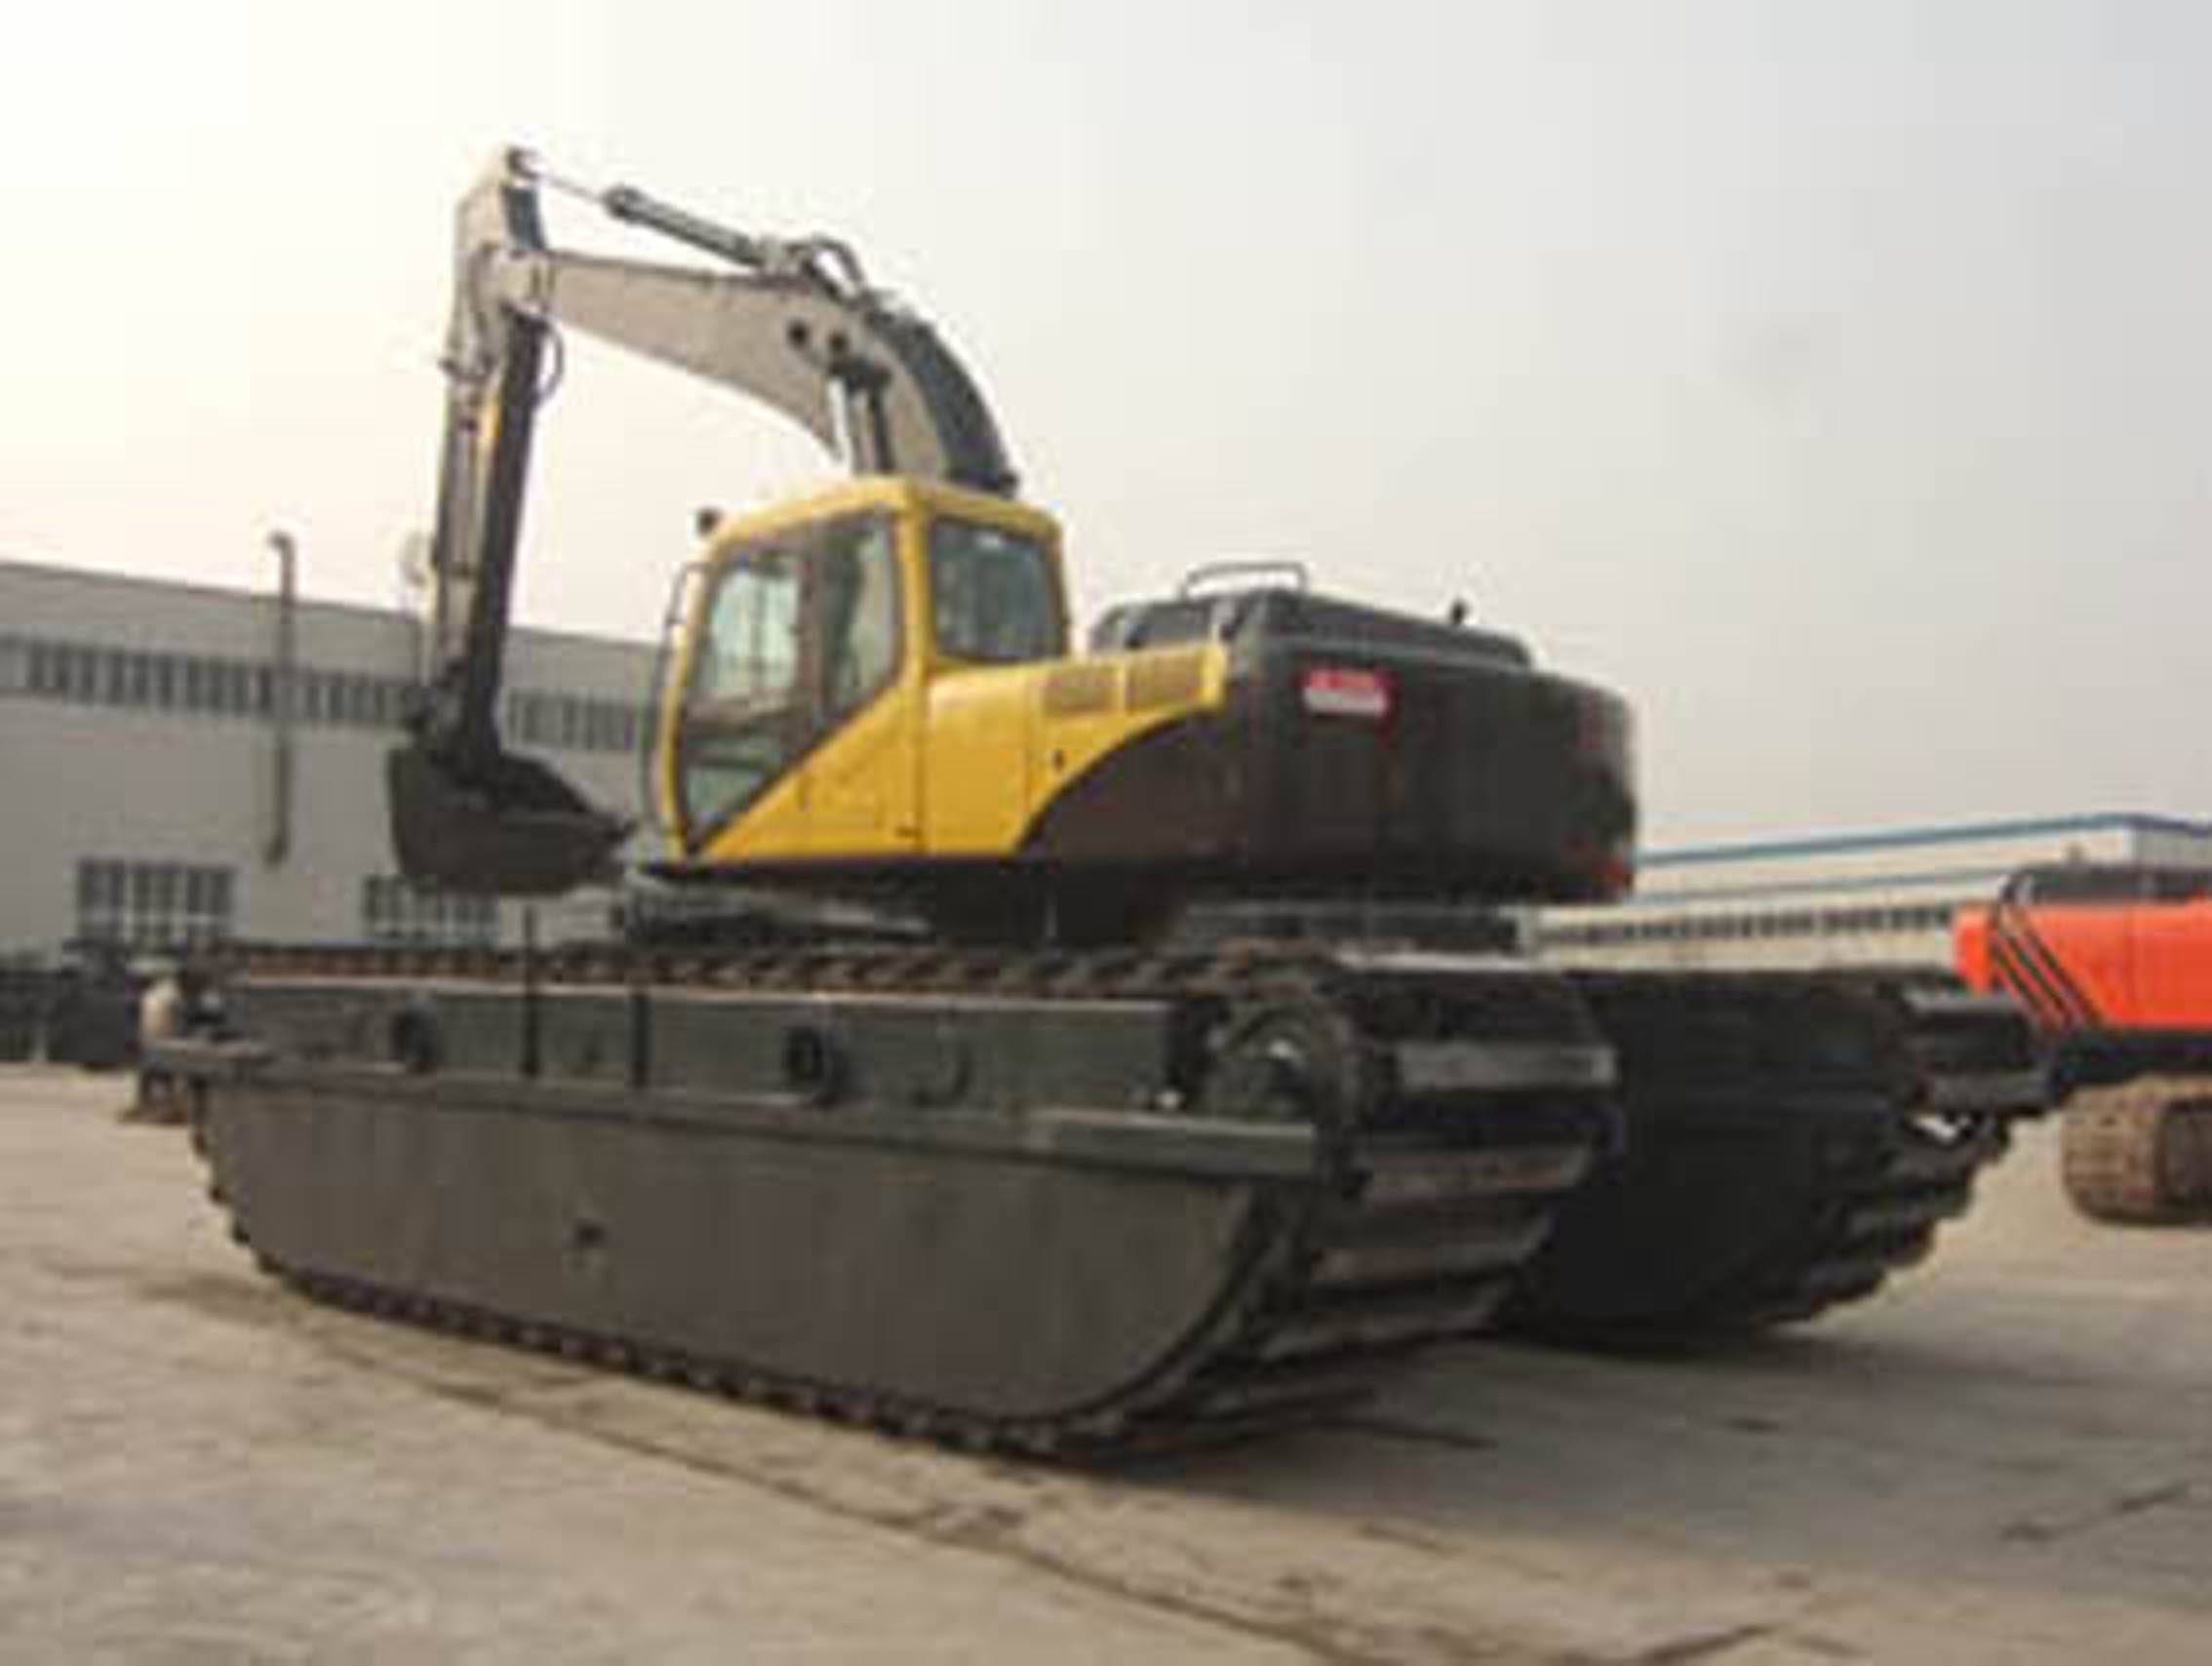 21tons Amphibious Excavator, AE210SD-2, -3, -4